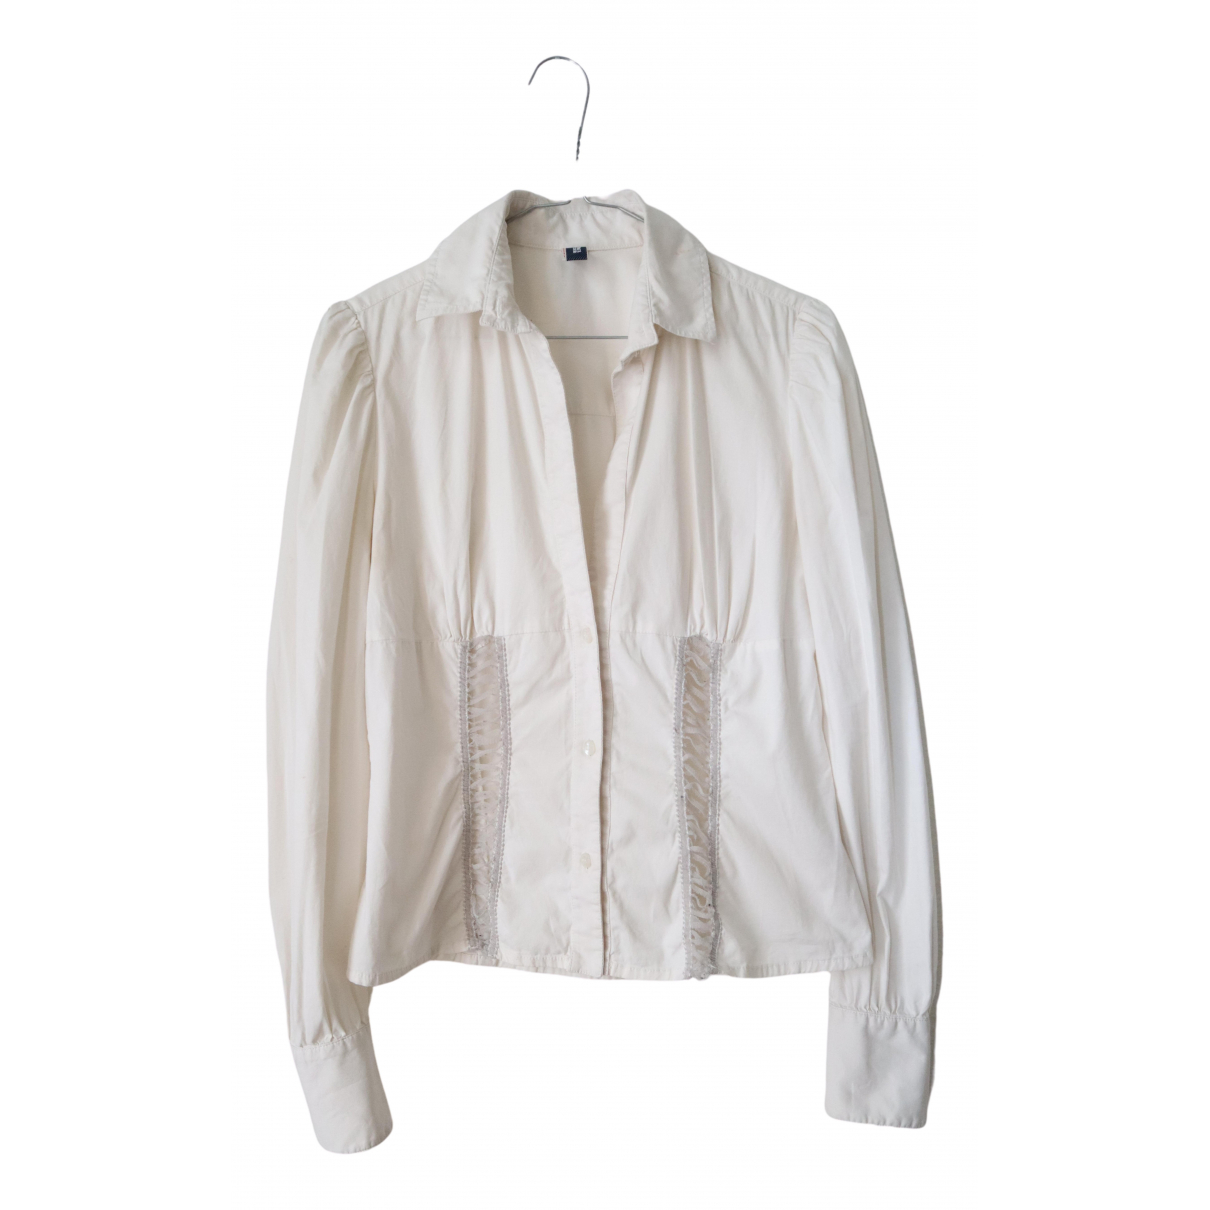 Camisa Jean Paul Gaultier